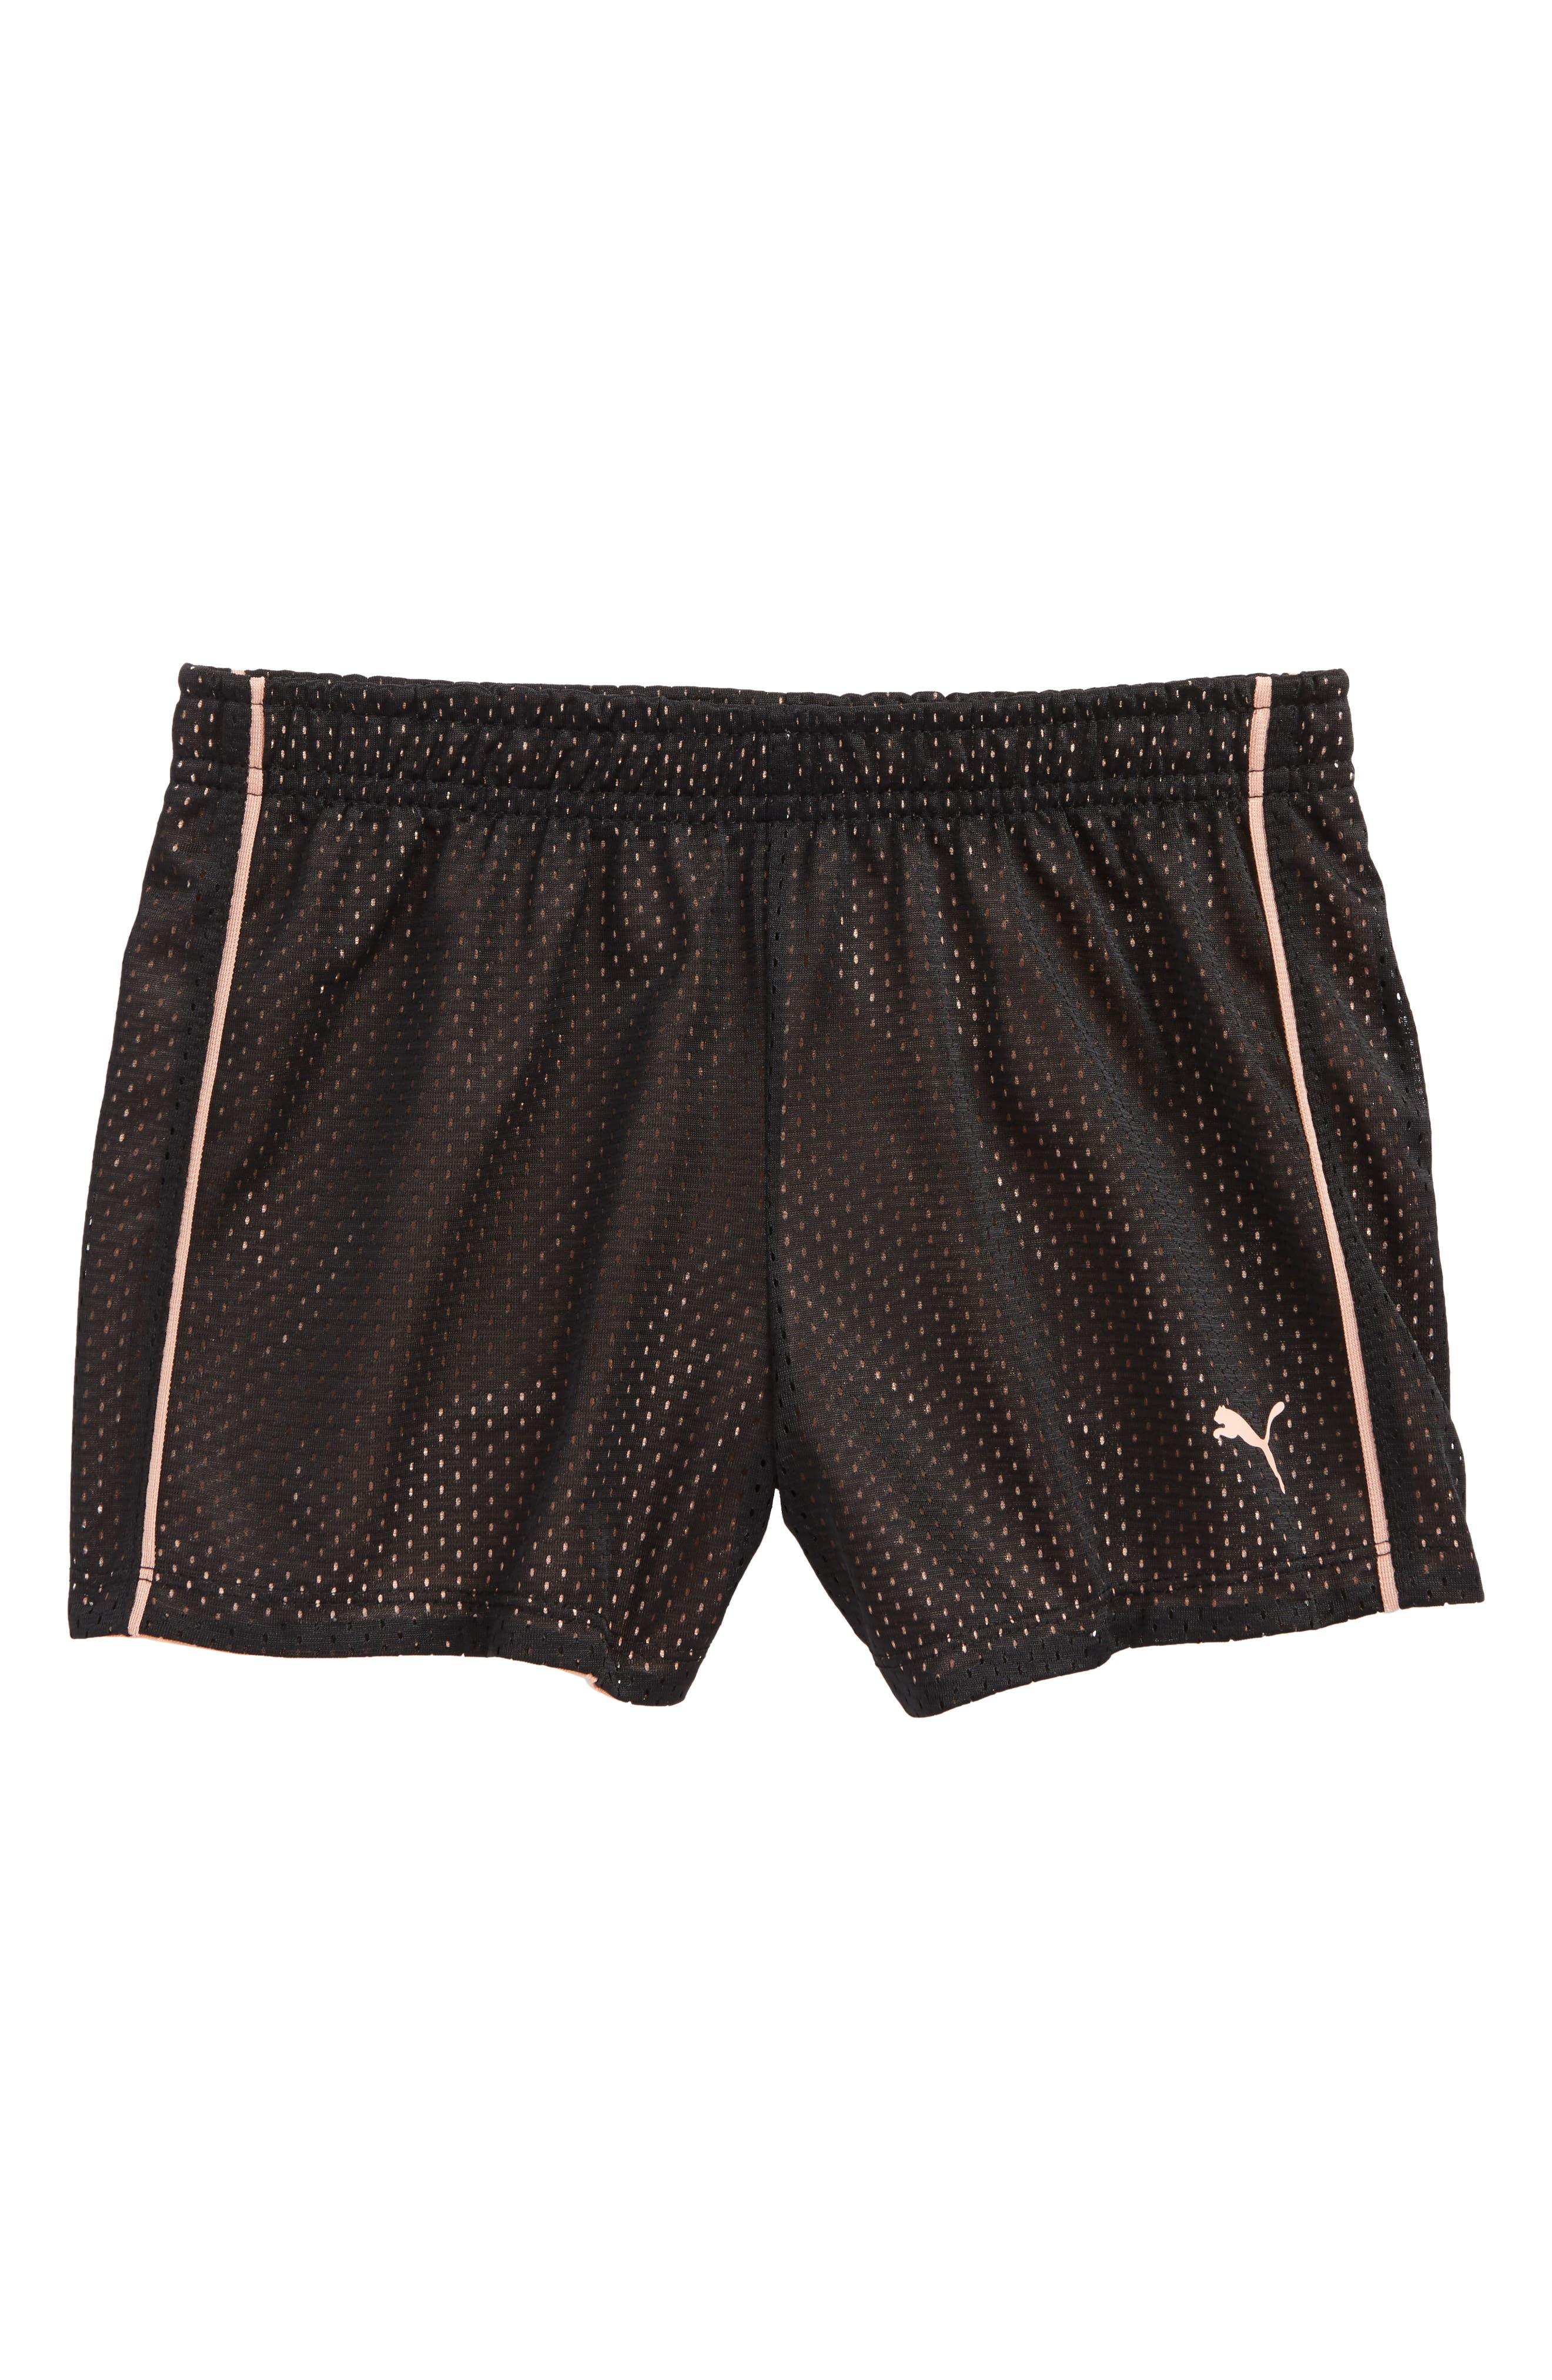 Mesh Shorts,                             Main thumbnail 1, color,                             Puma Black